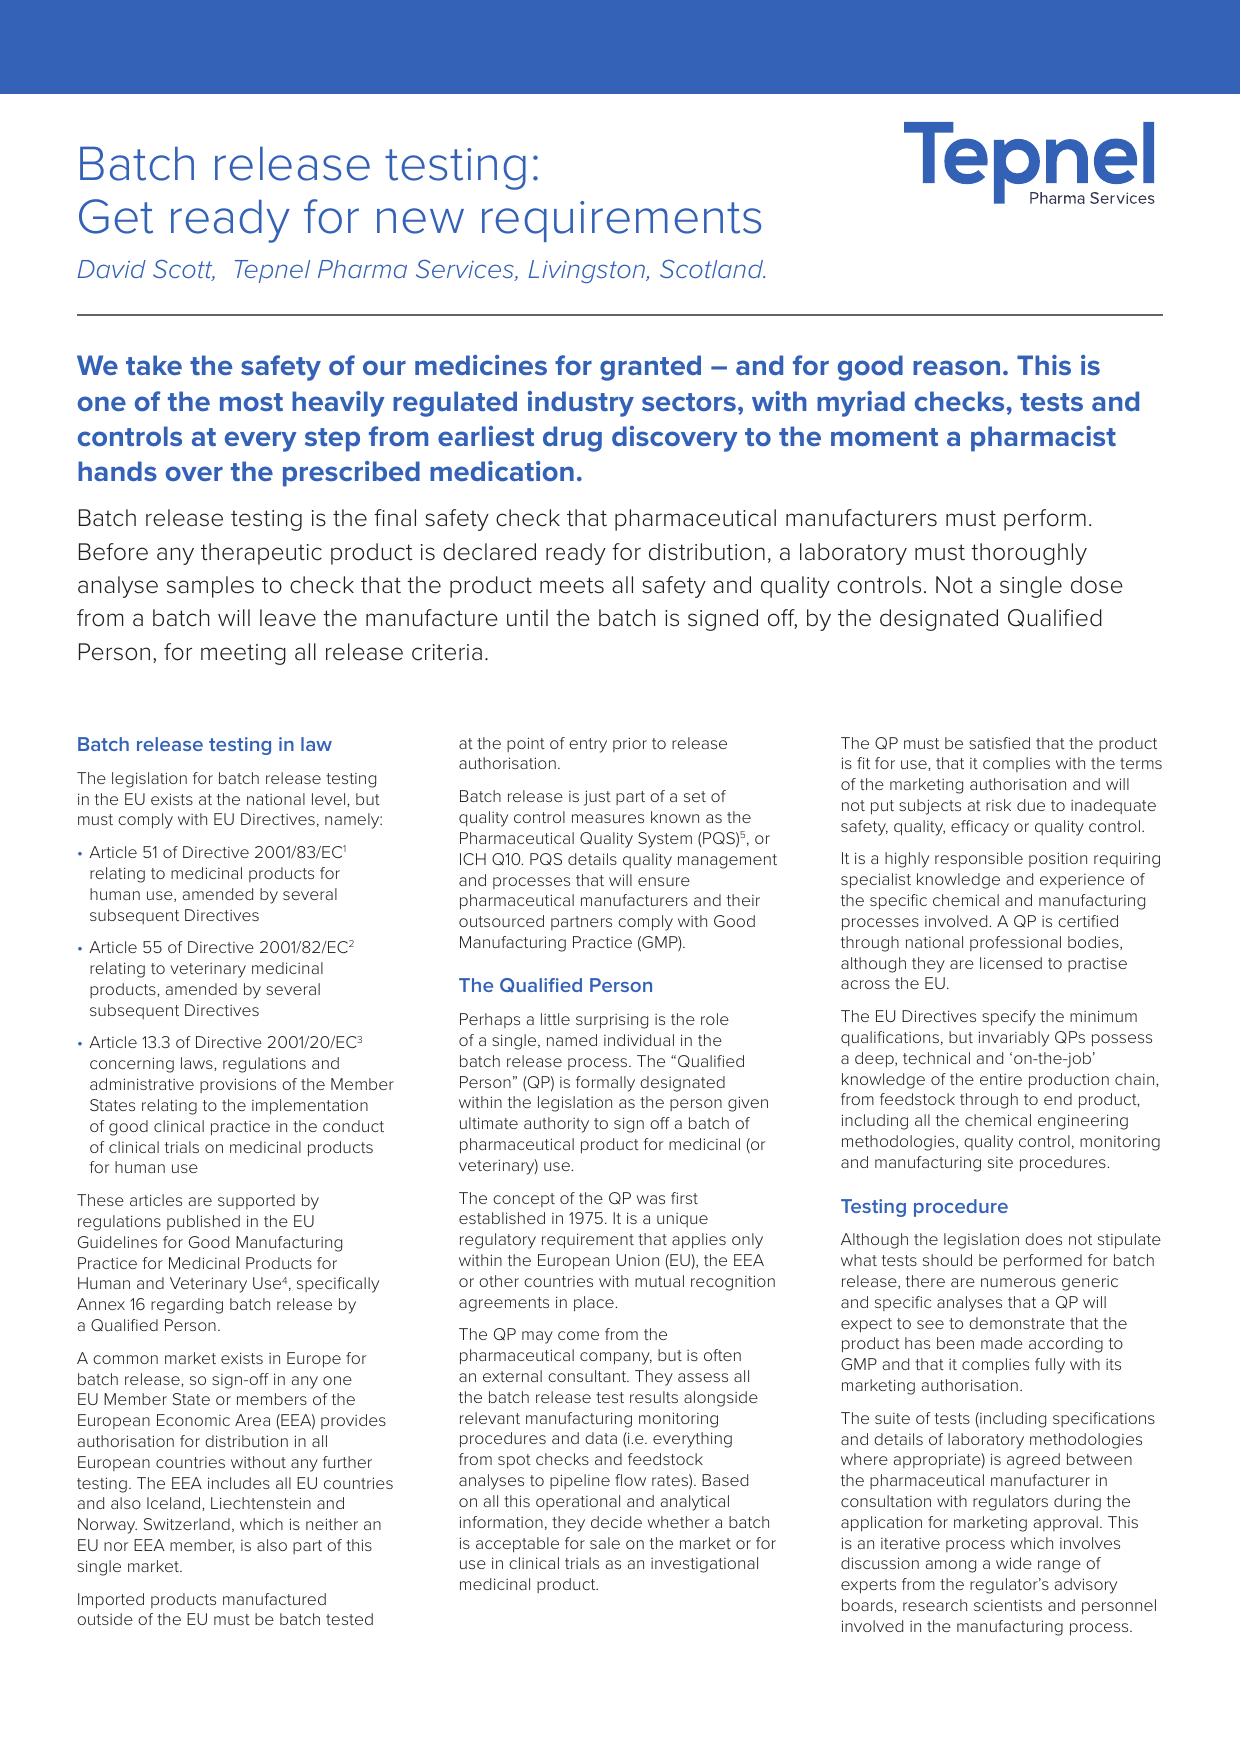 Batch release testing - Tepnel Pharma Services